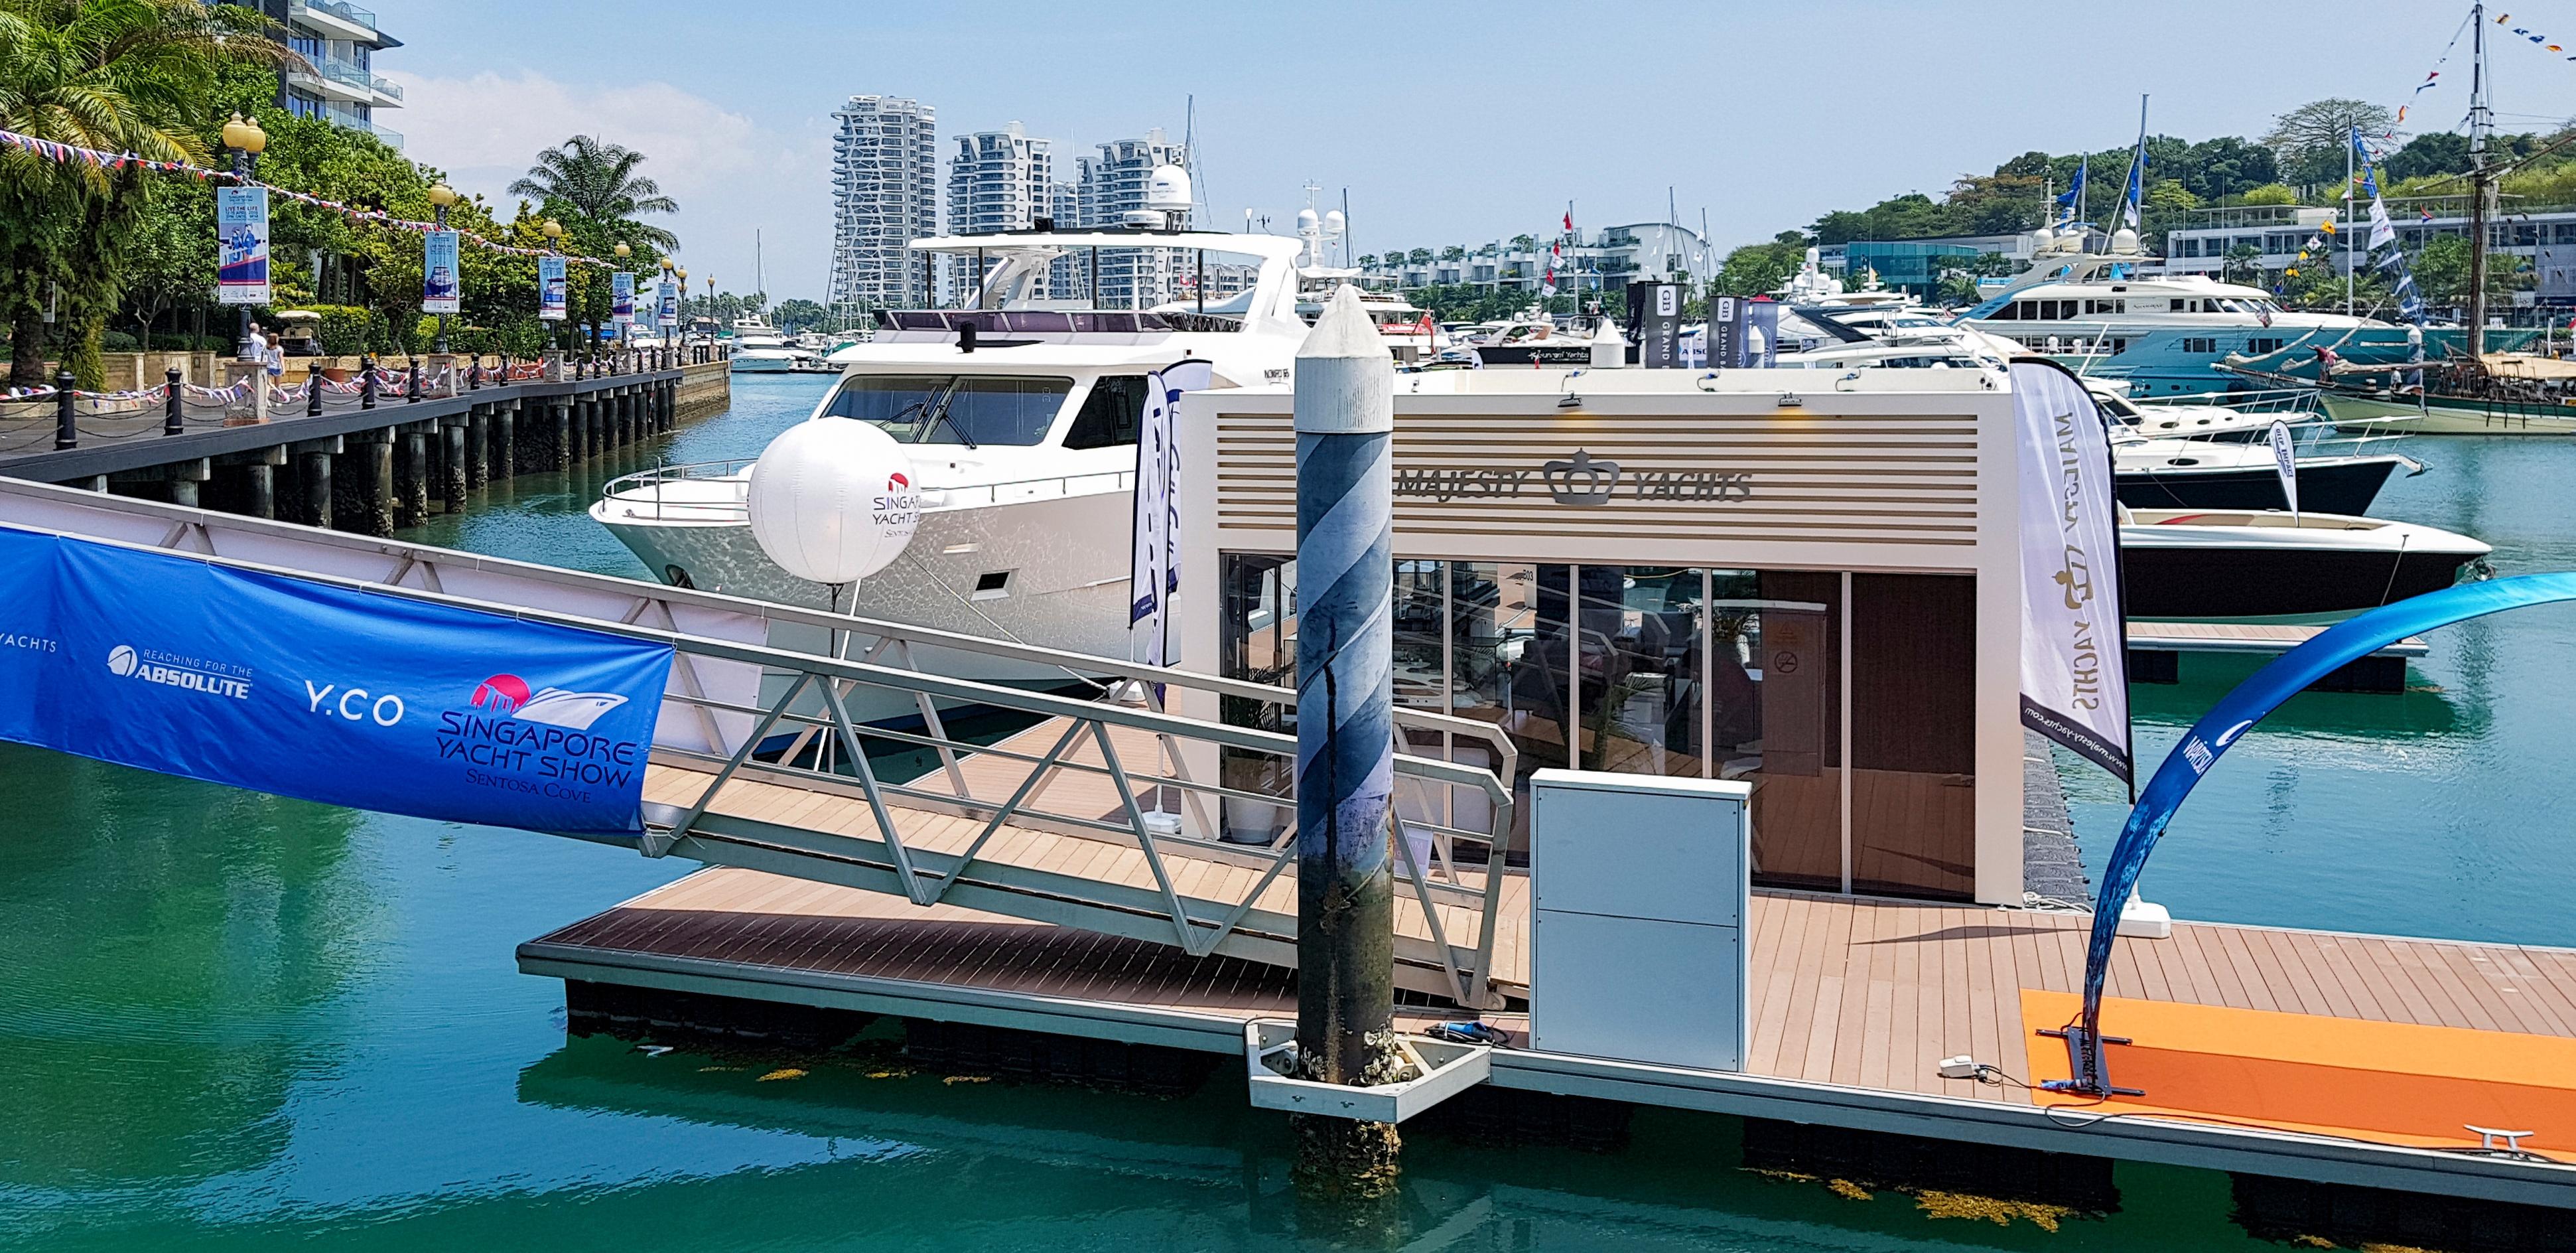 Gulf Craft at Singapore Yacht Show 2018 Day 1 (1).jpg